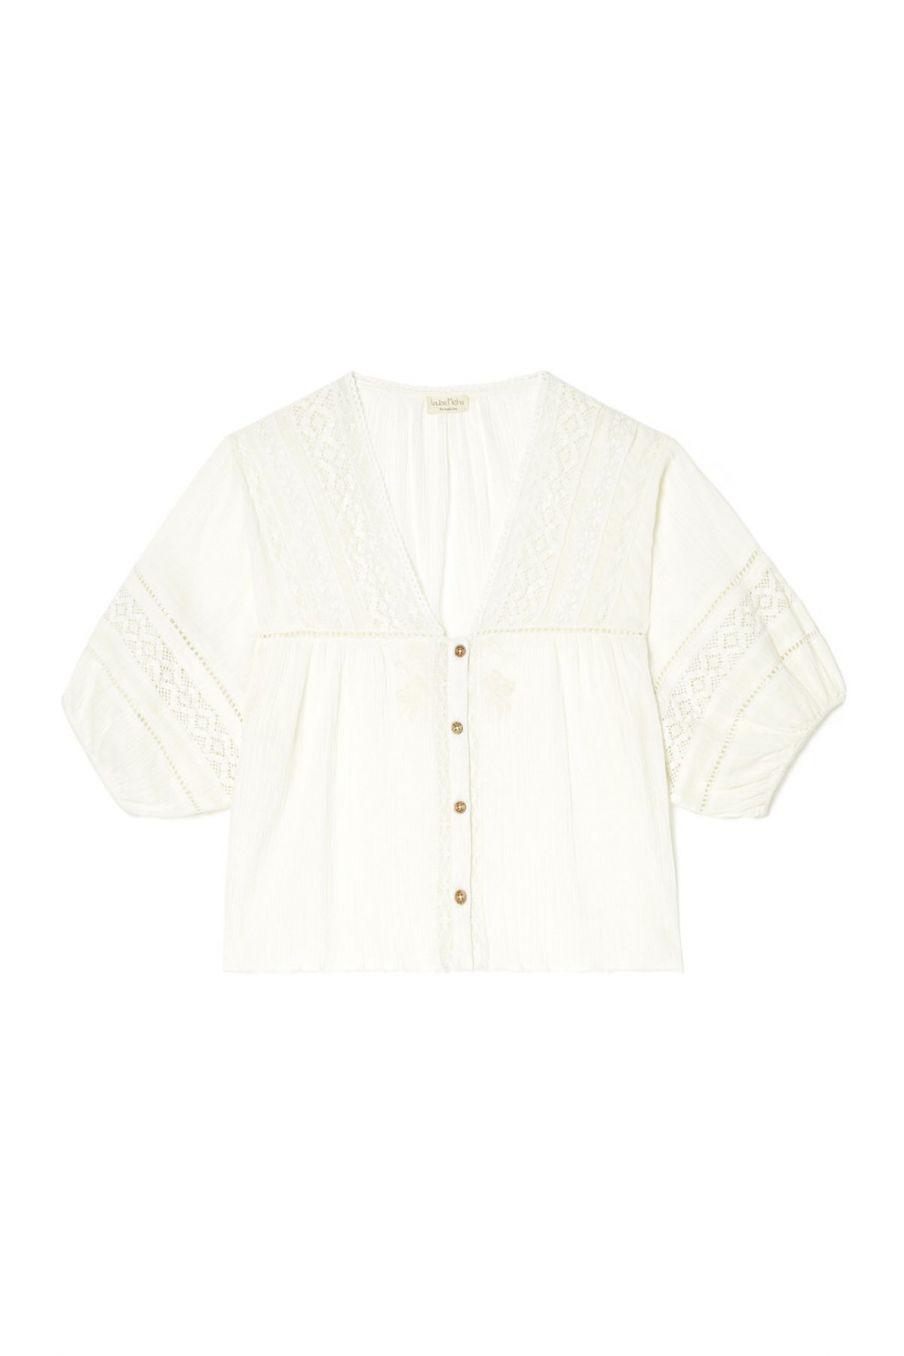 boheme chic vintage blouse femme amara ecru